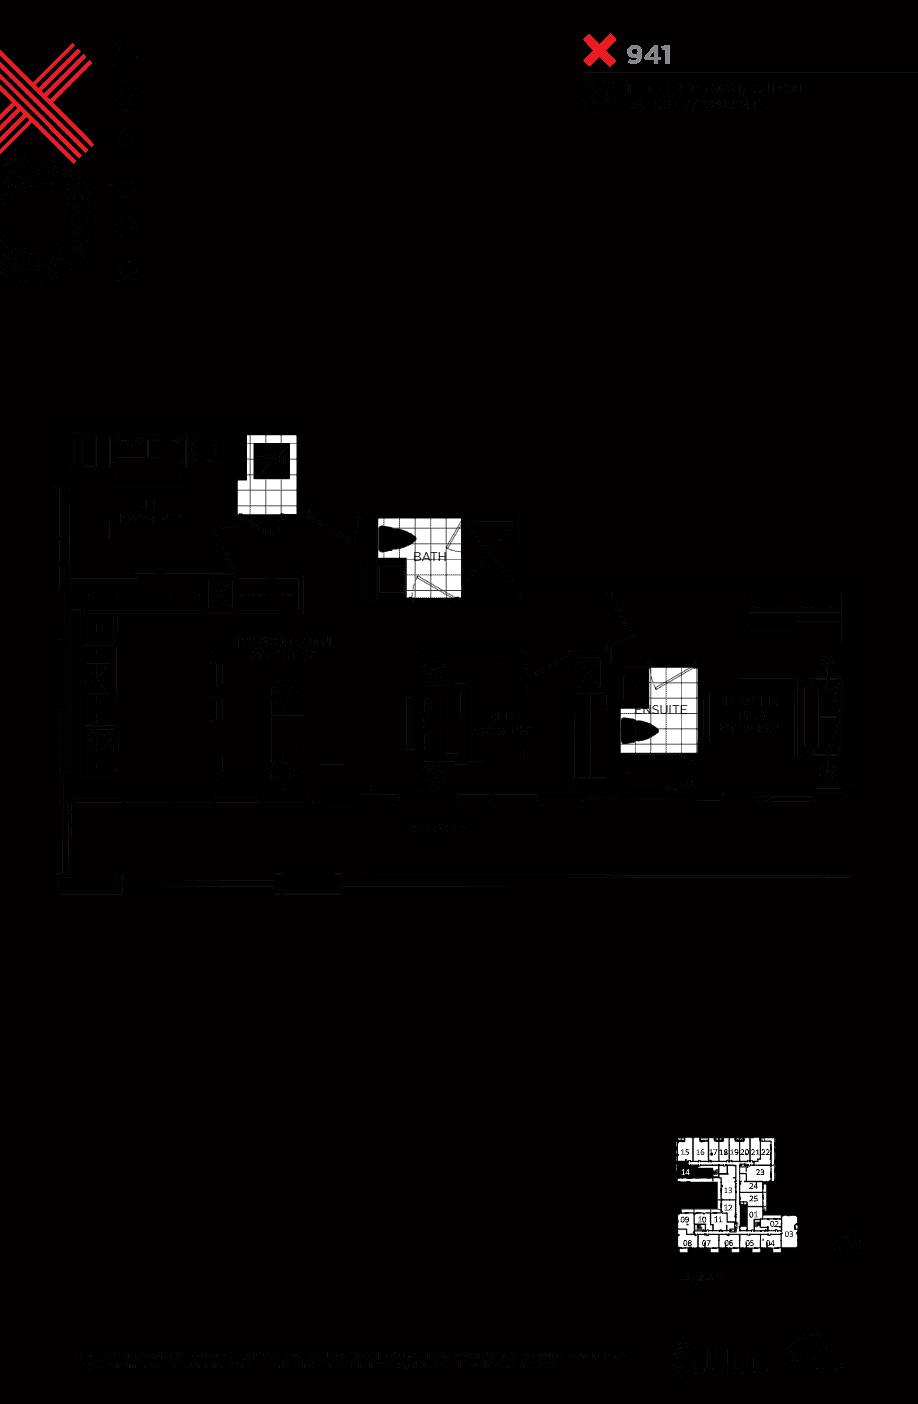 2019 04 09 03 14 30 xo condos floor plans part16 1